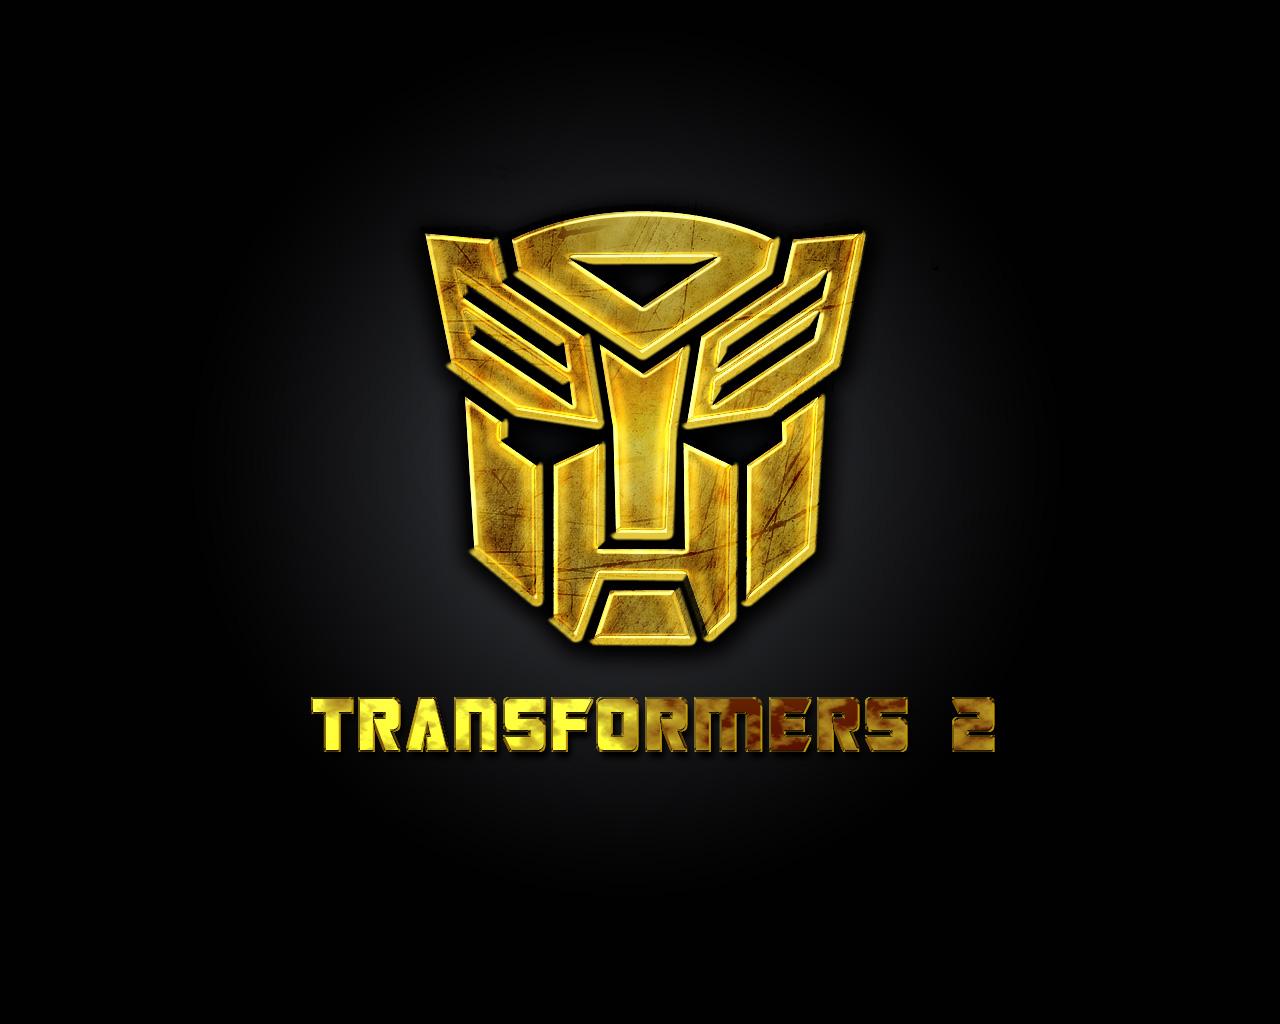 12801024 Autobots Logo Golden Digital Citizen